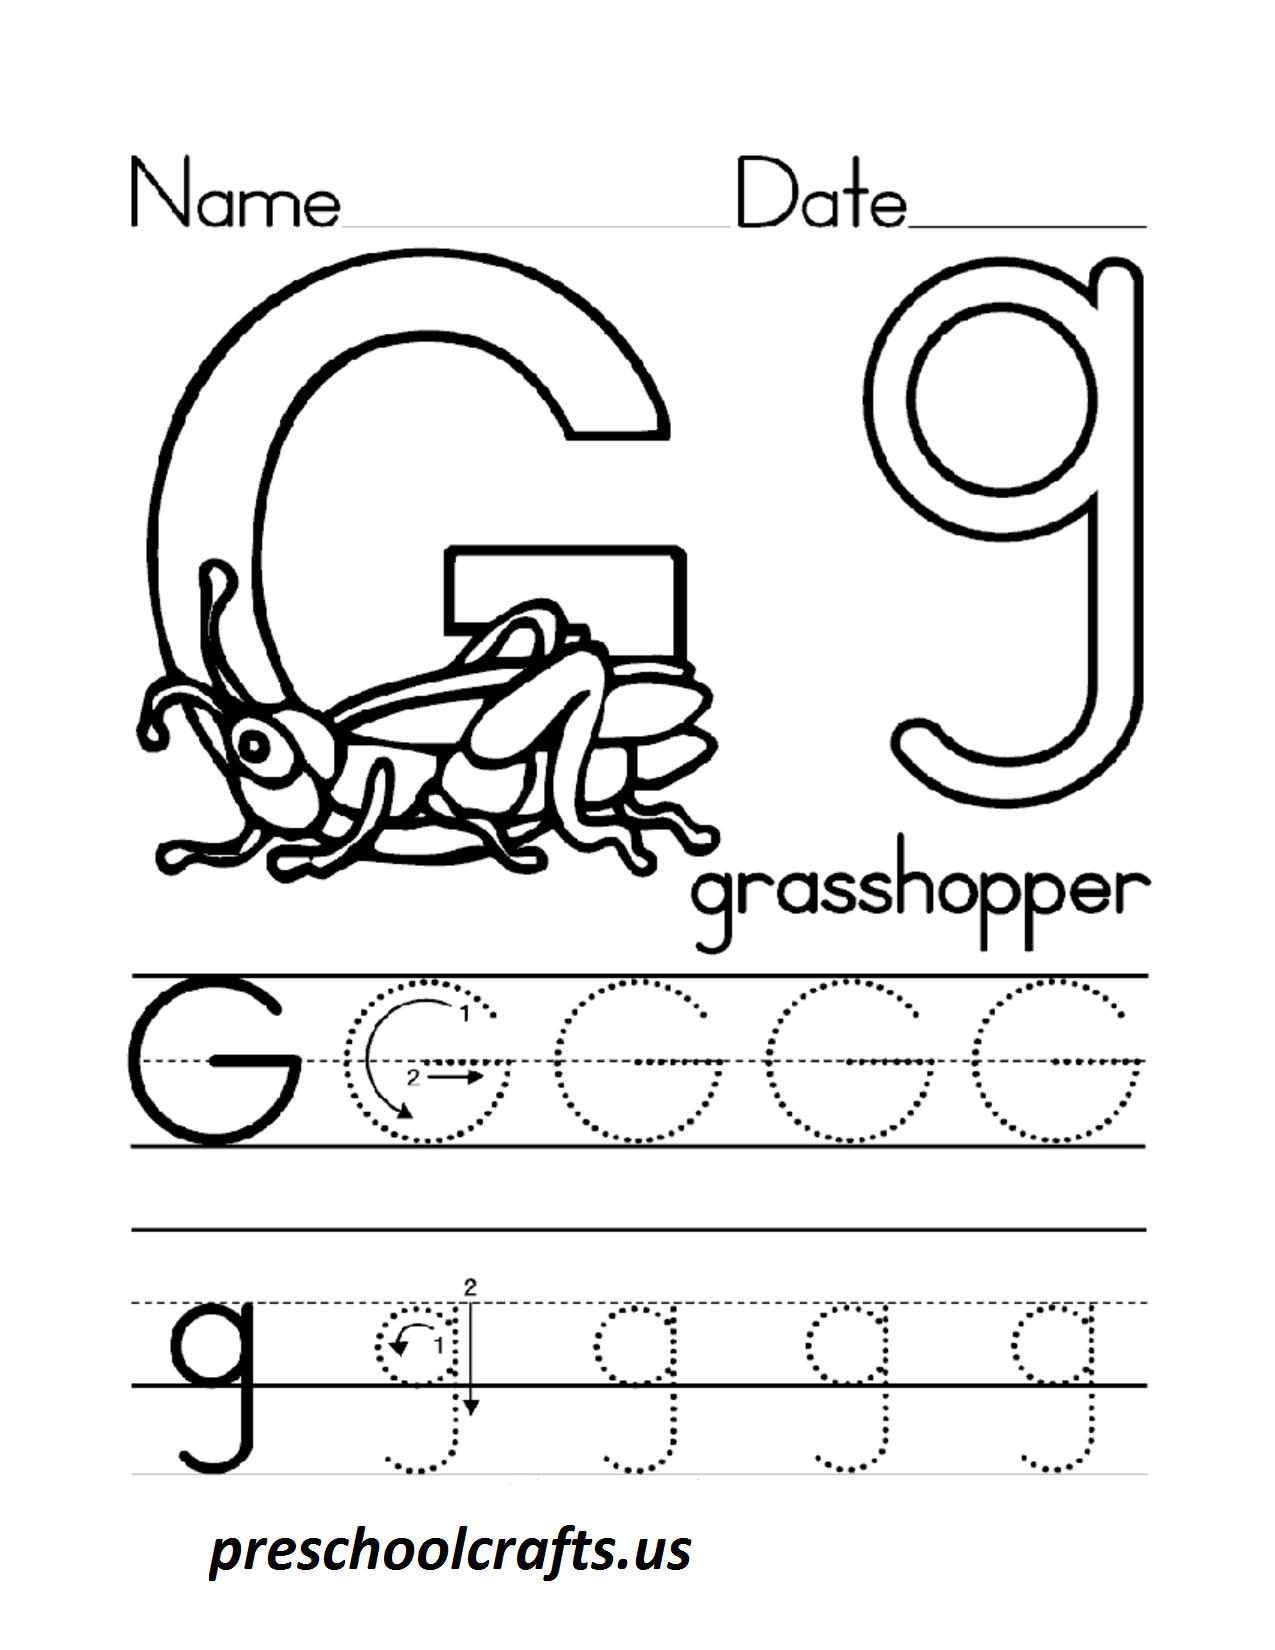 Letter G Worksheets For Preschool Preschool Crafts